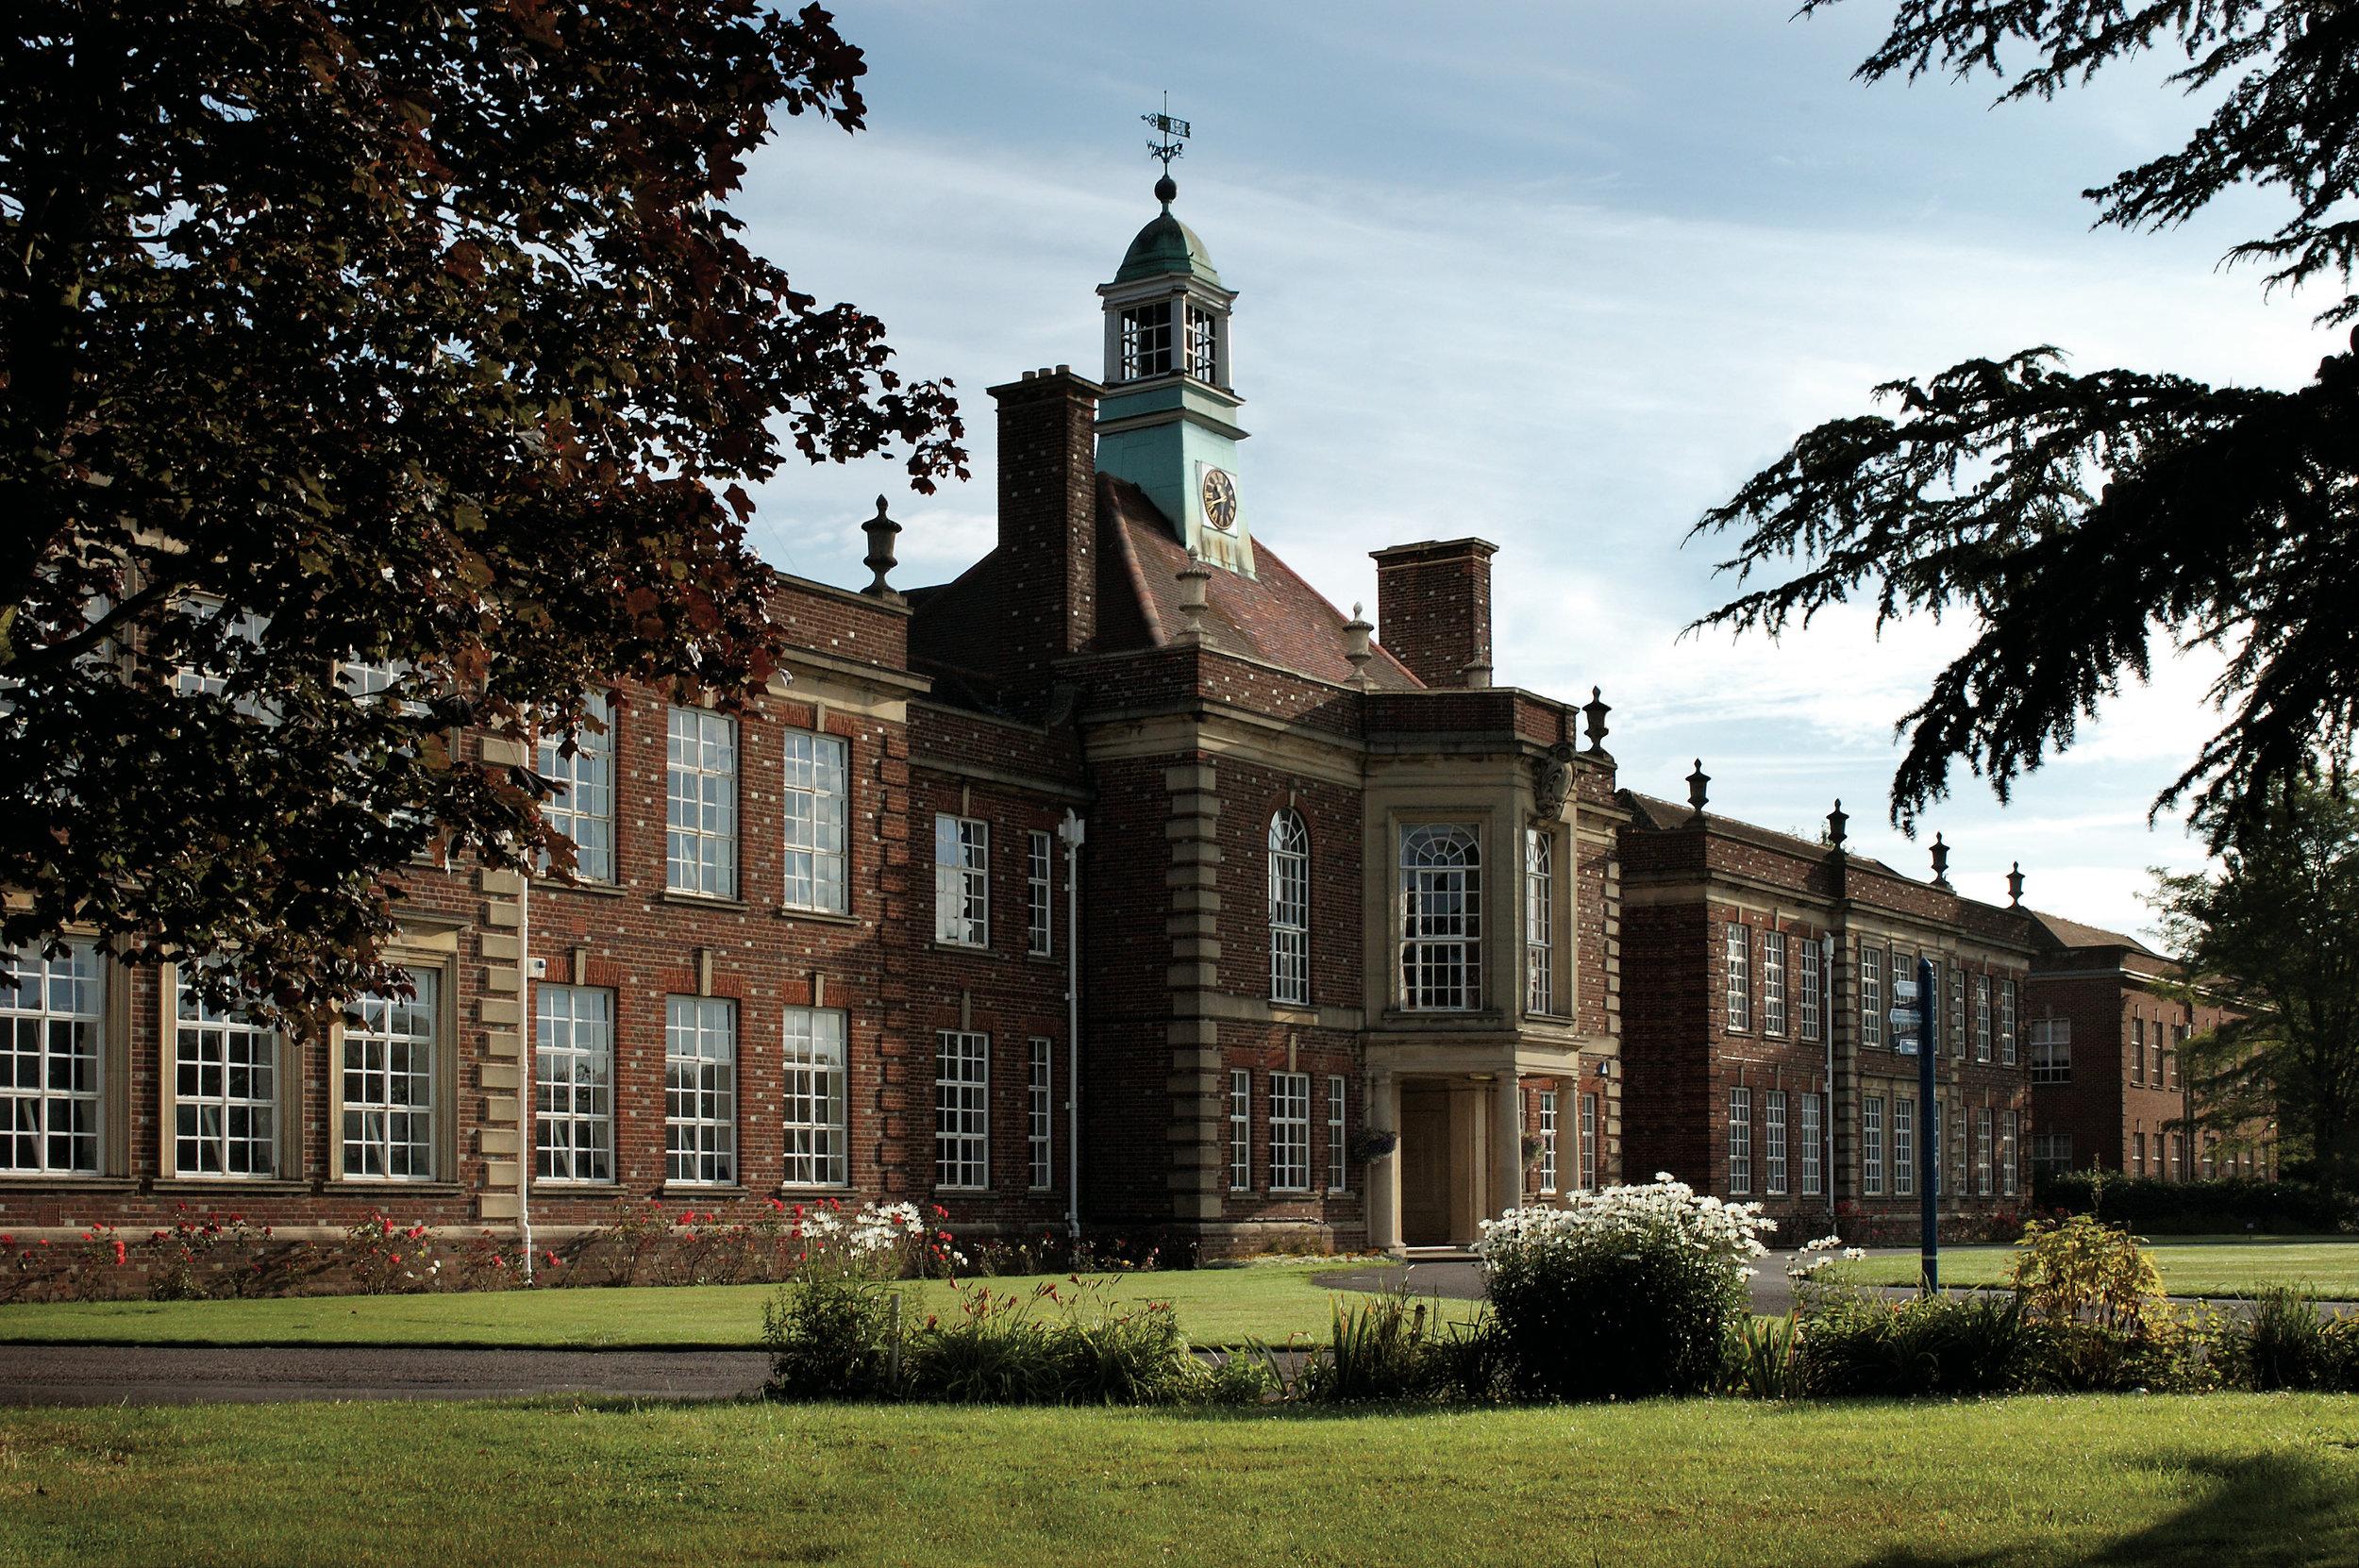 Headington school pic.jpg